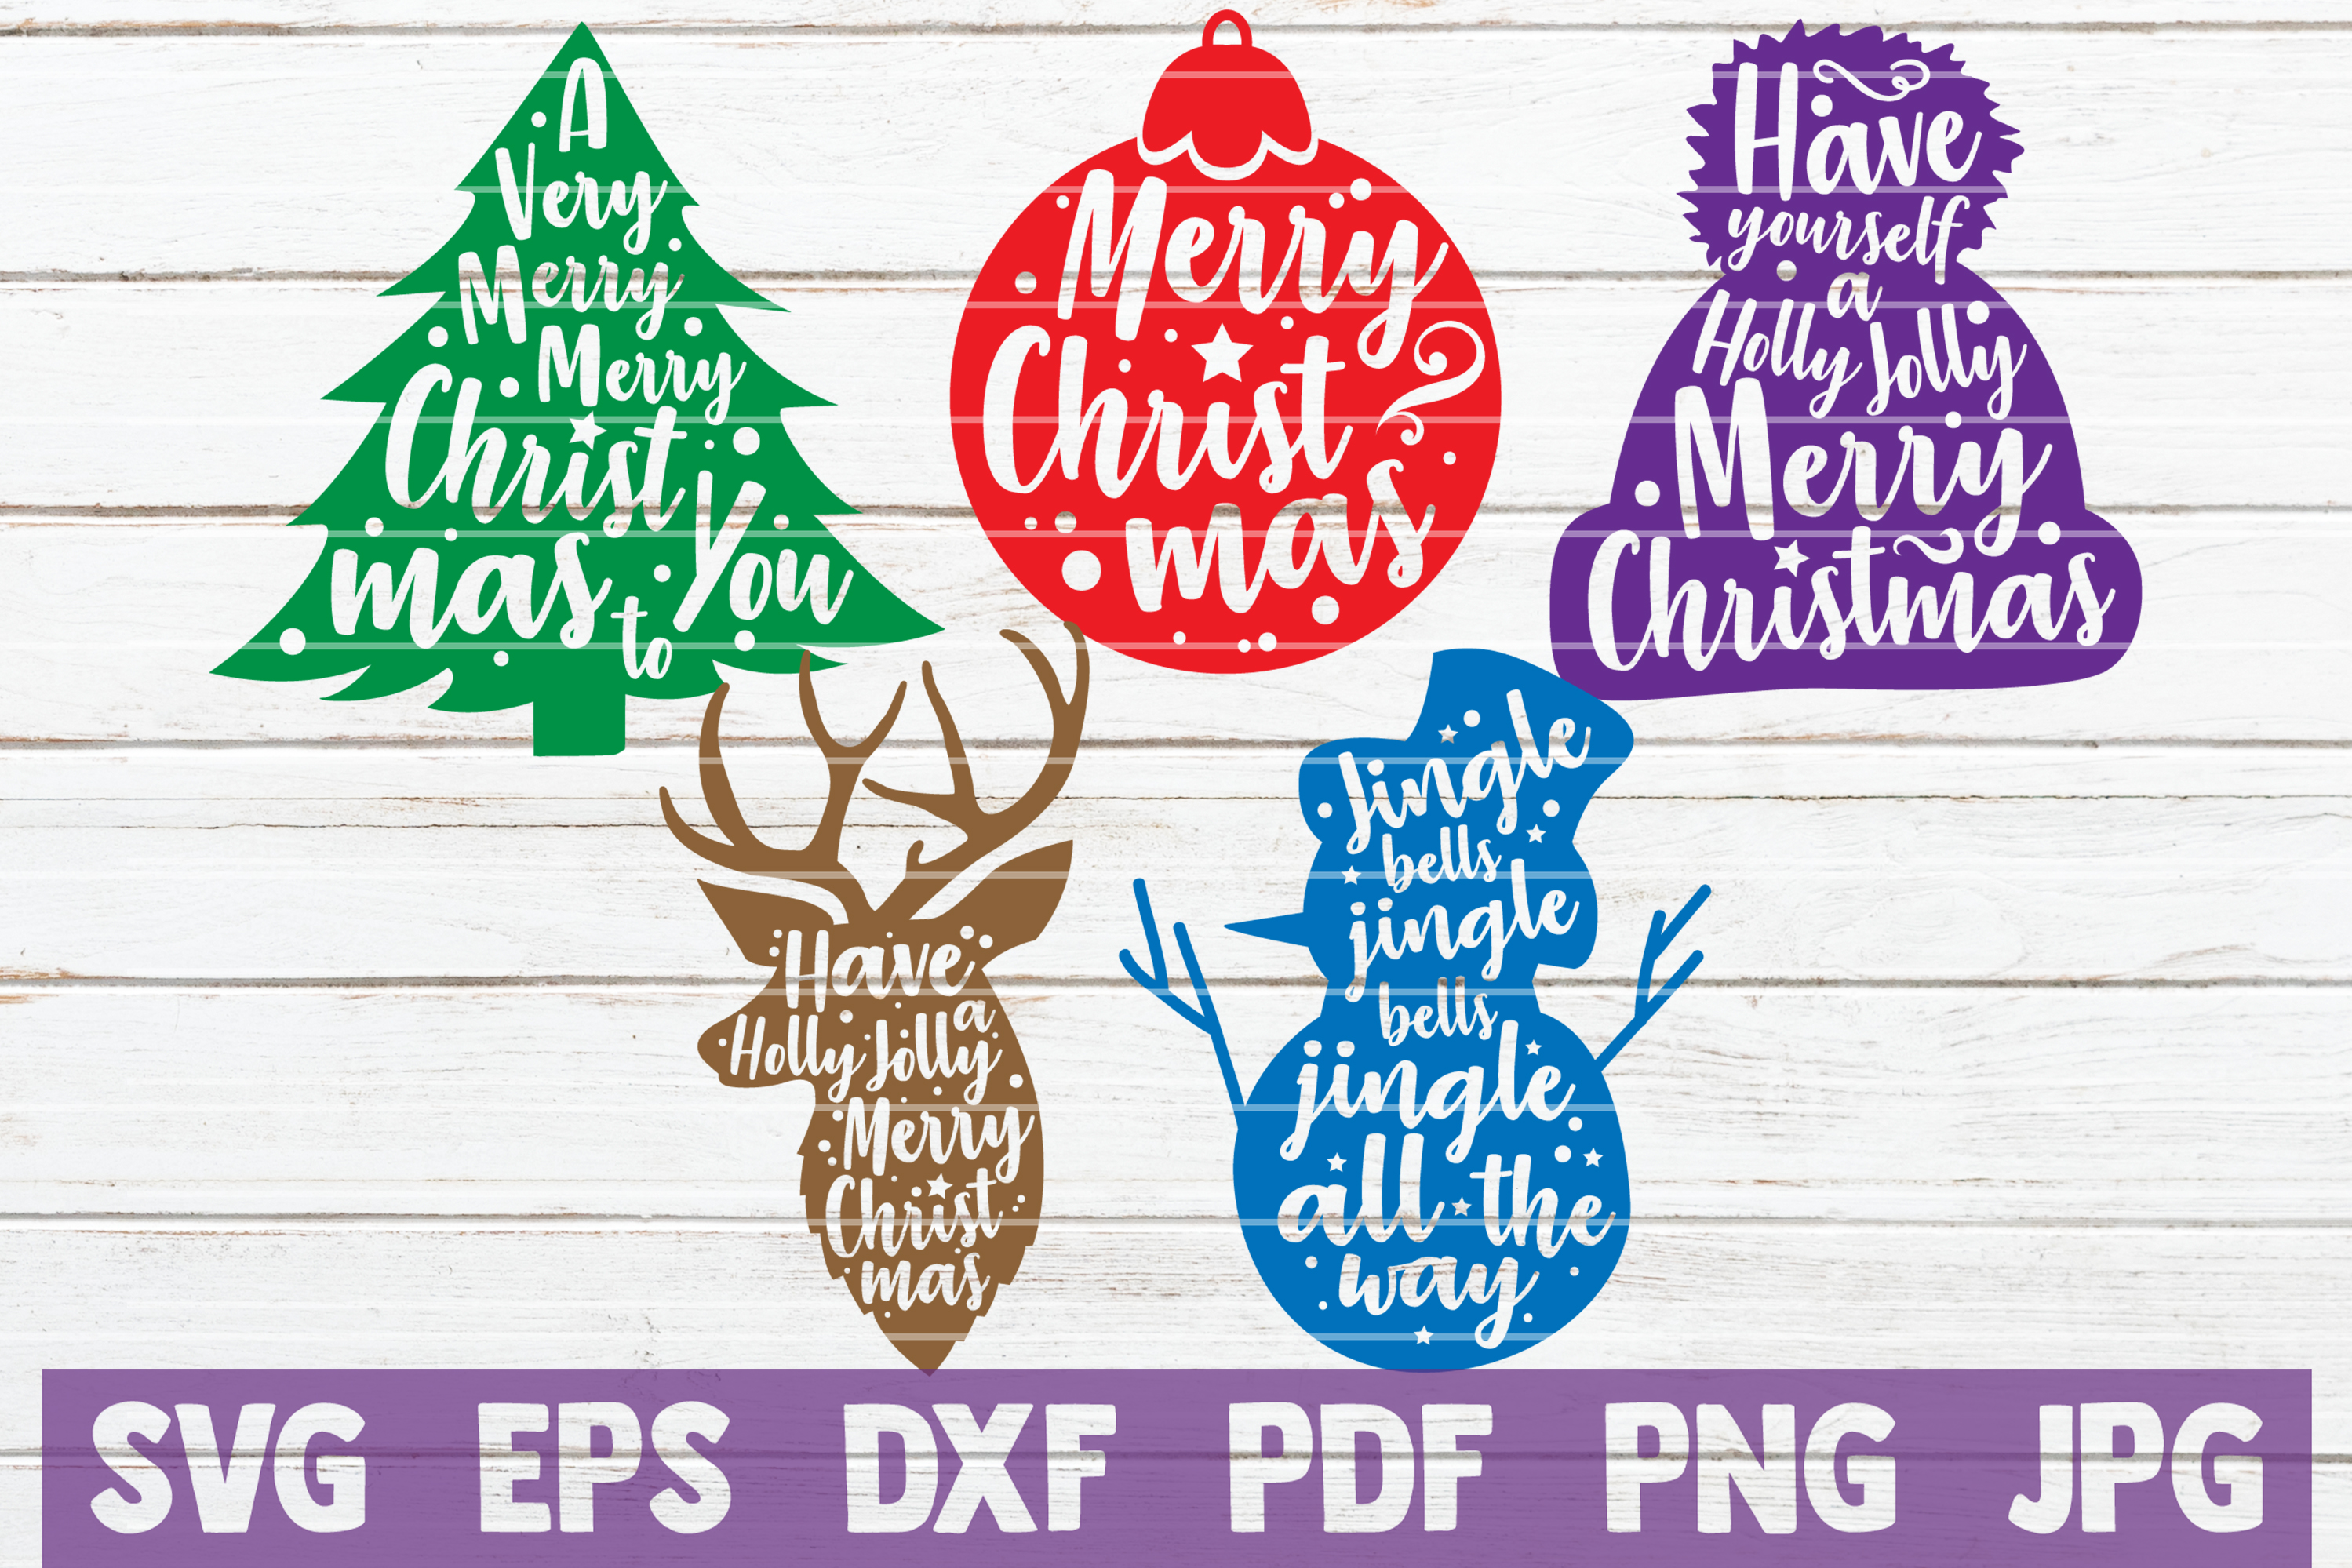 Christmas SVG Bundle | SVG Cut Files example image 1